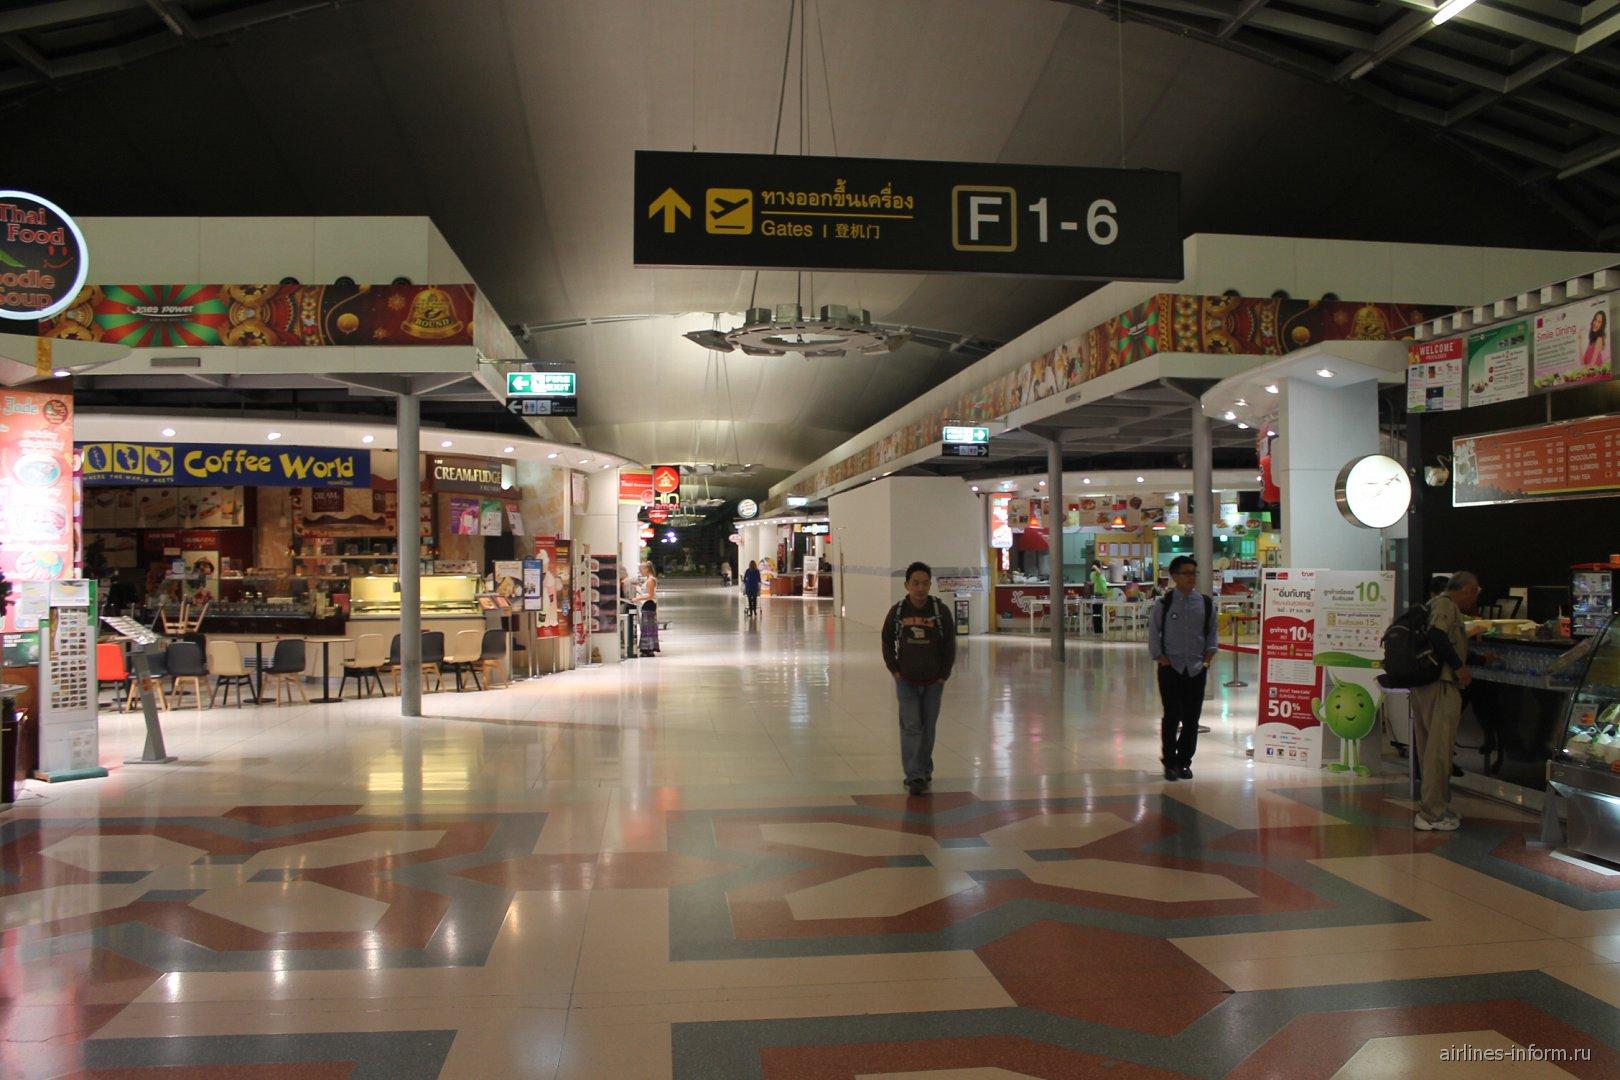 Bangkog International airport